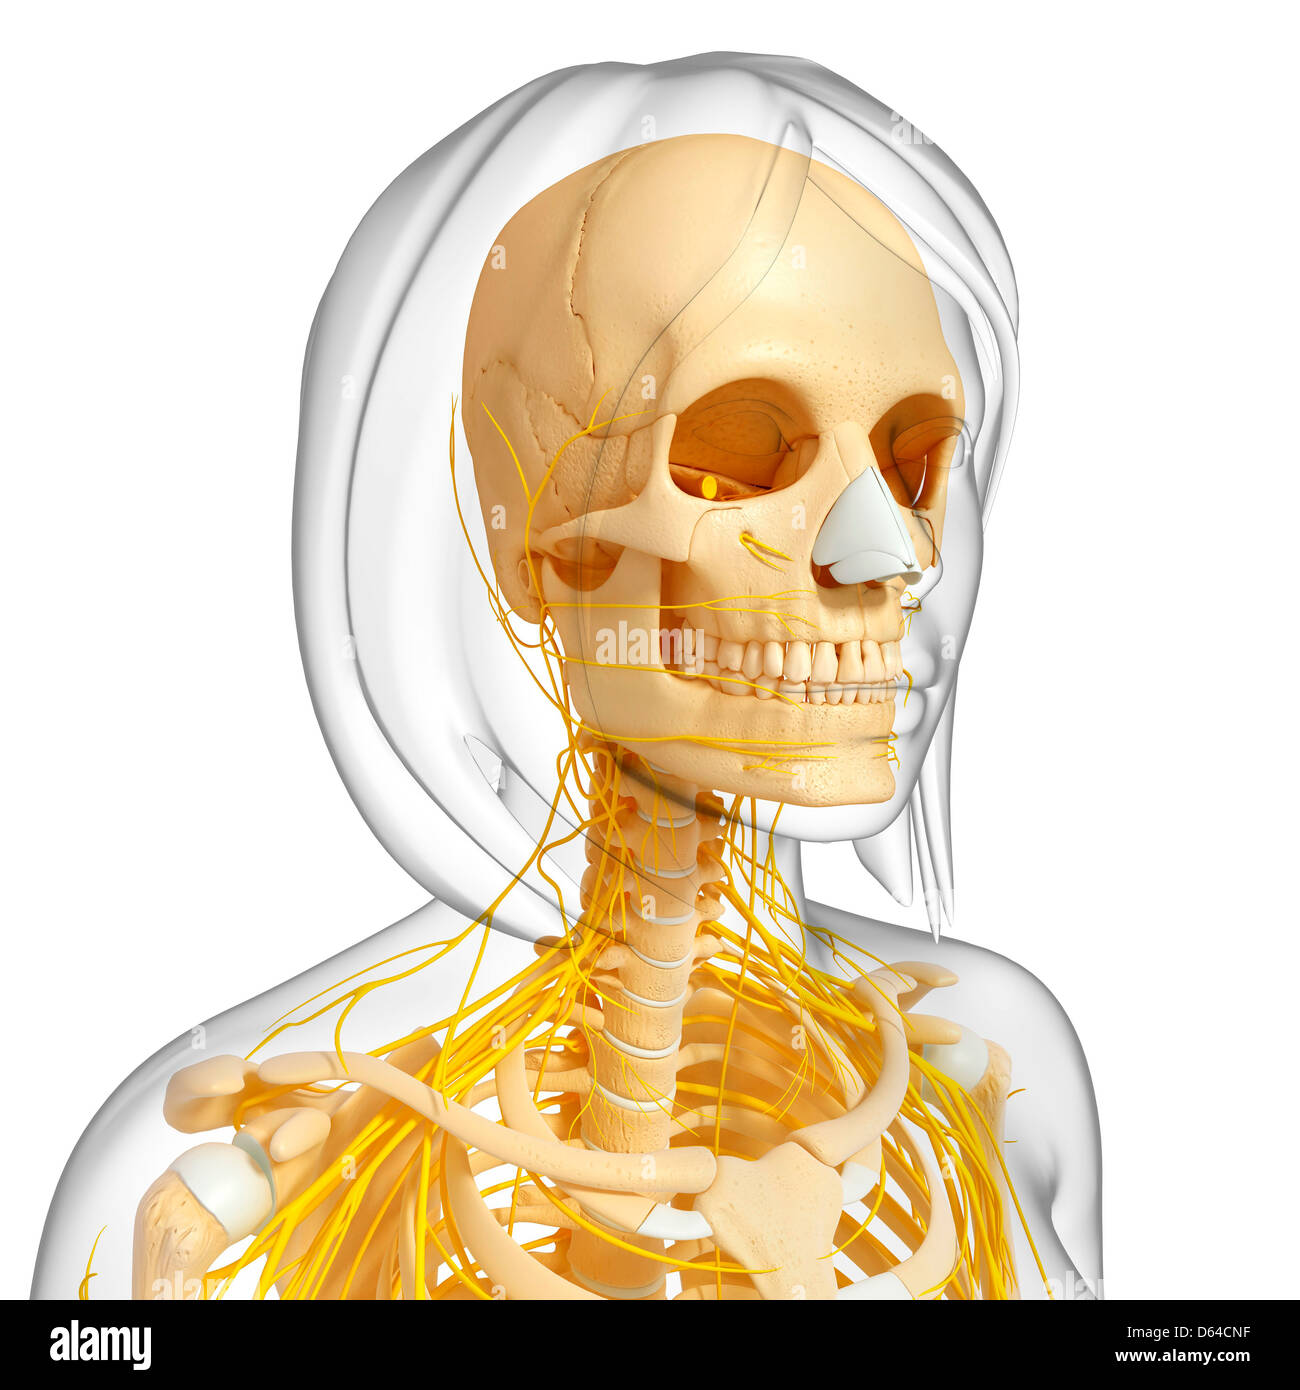 Collar Bone Clavicle Jaw Stock Photos Collar Bone Clavicle Jaw